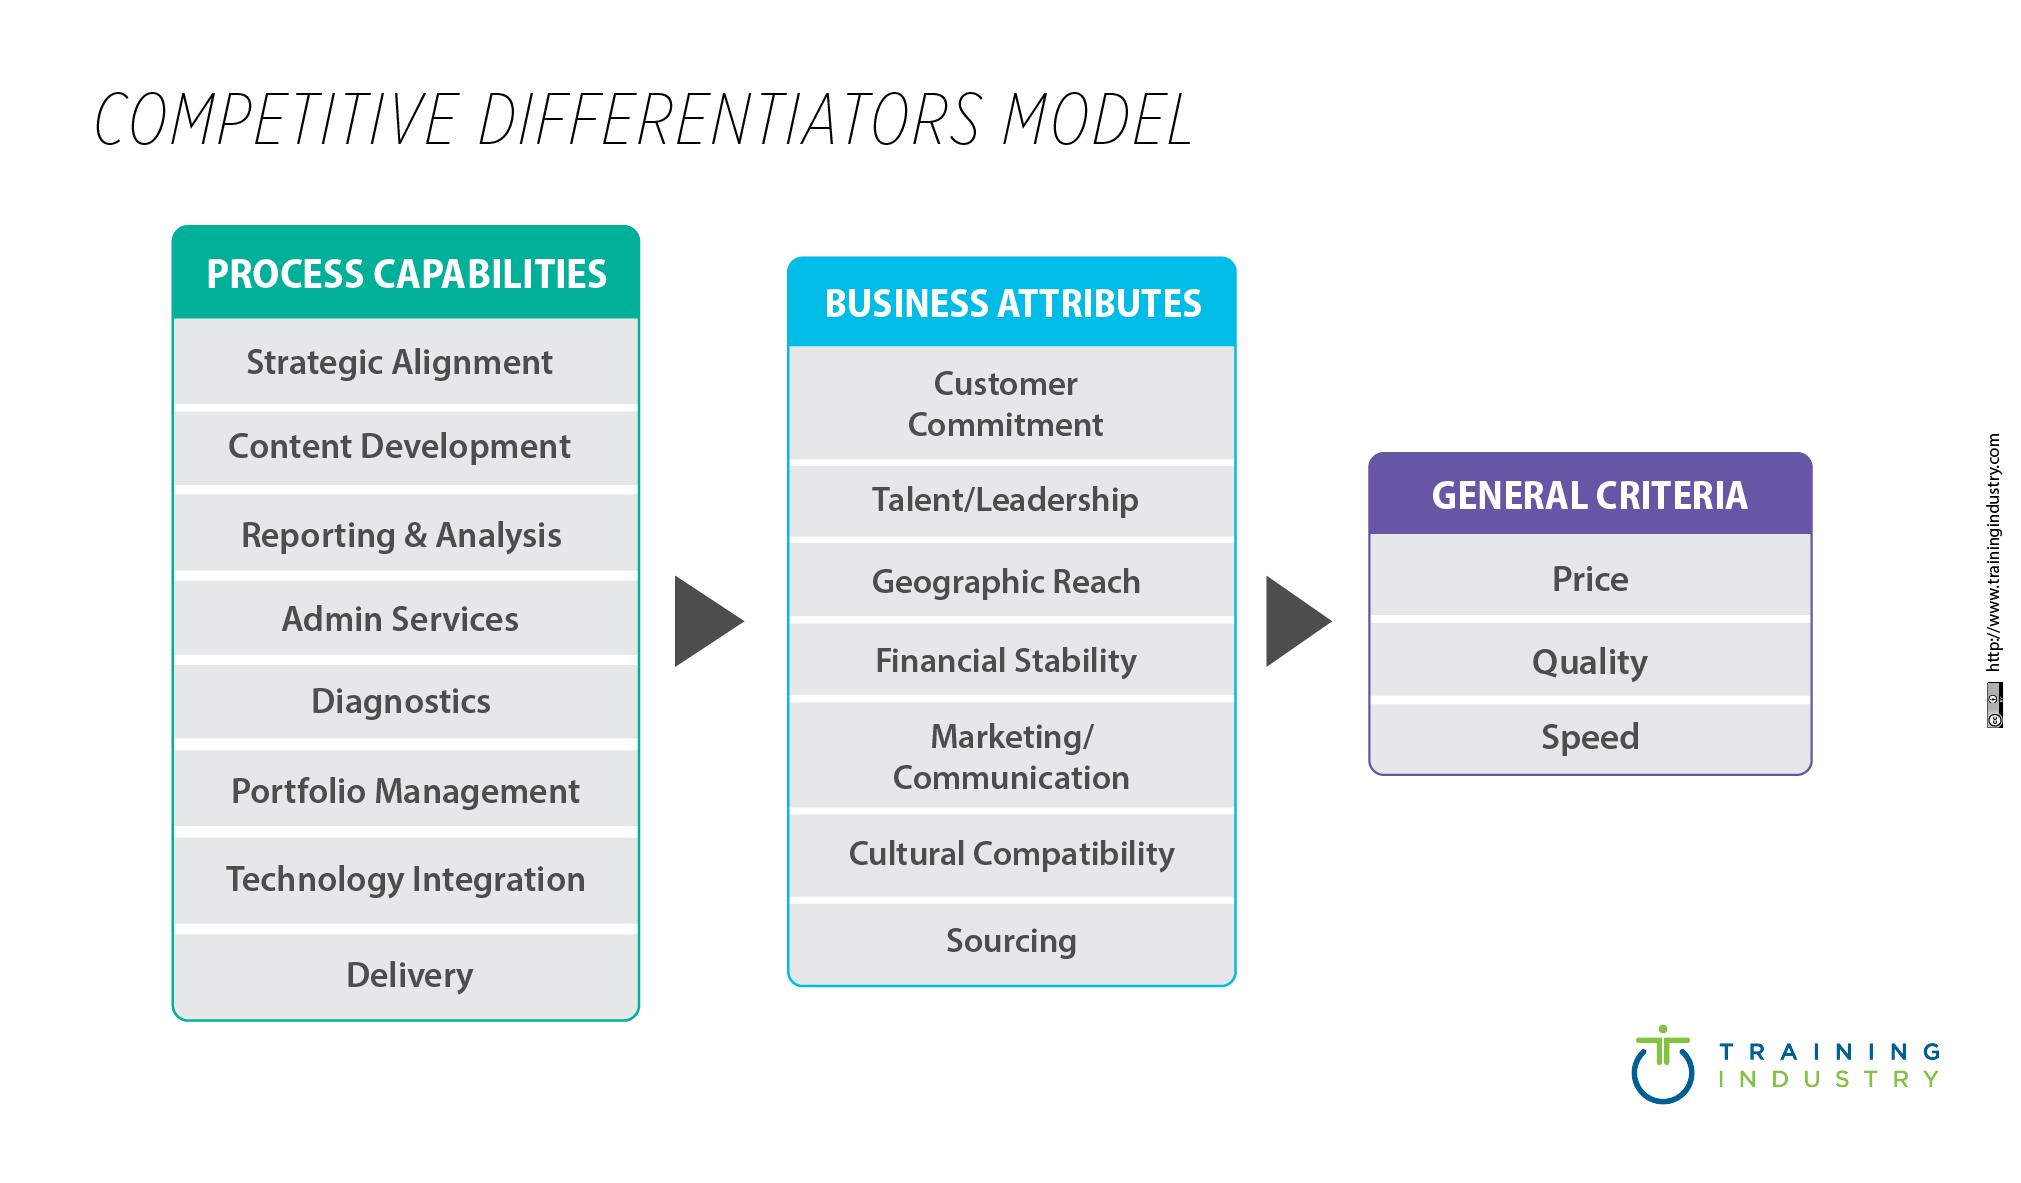 Competitive Differentiators Model